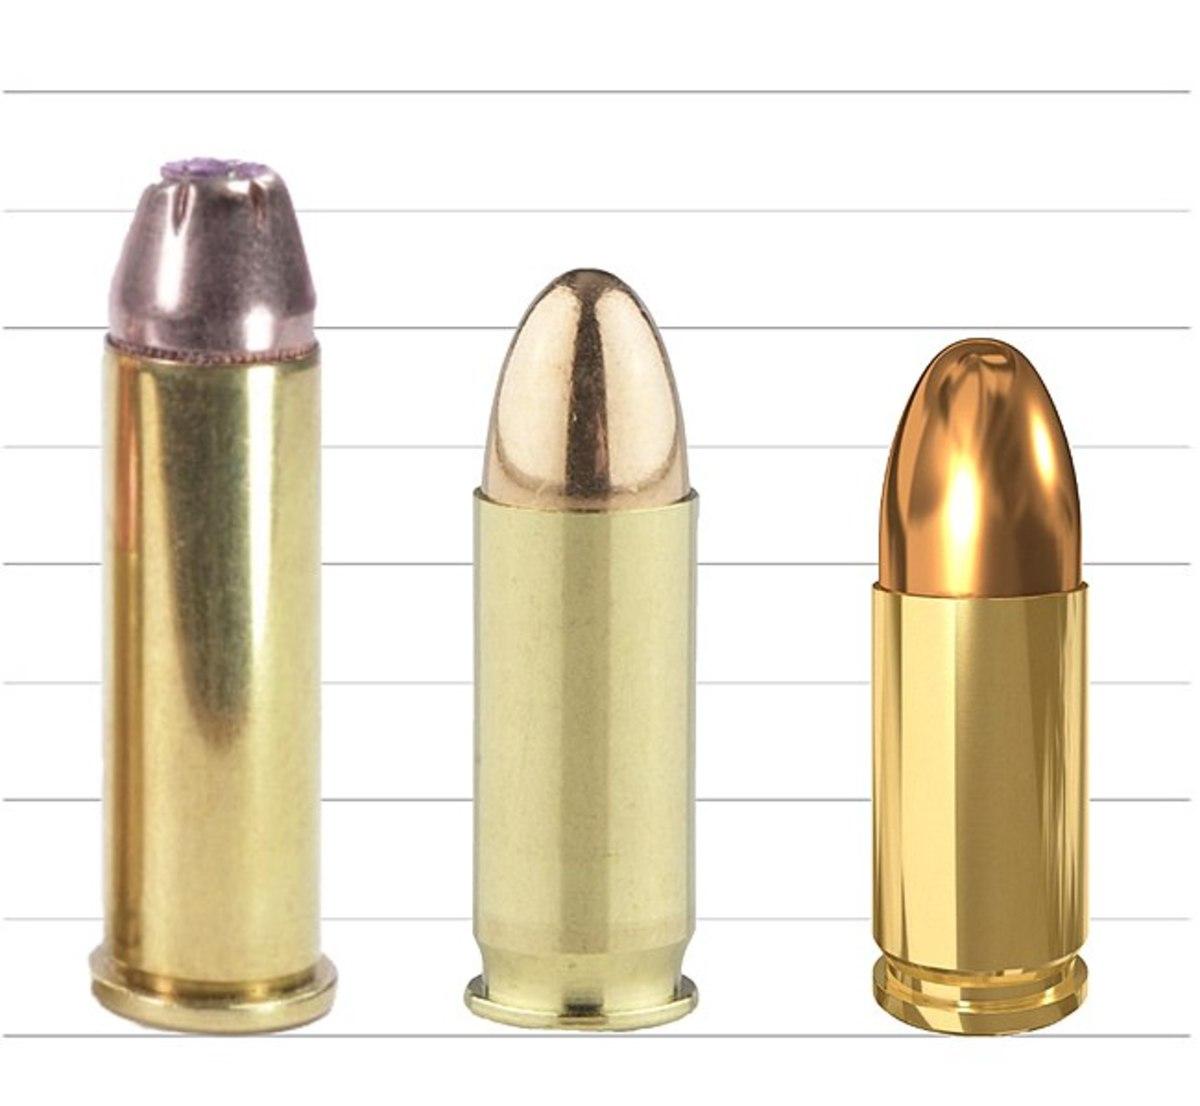 (L-R) .357 Magnum, .38 Super, 9x19mm